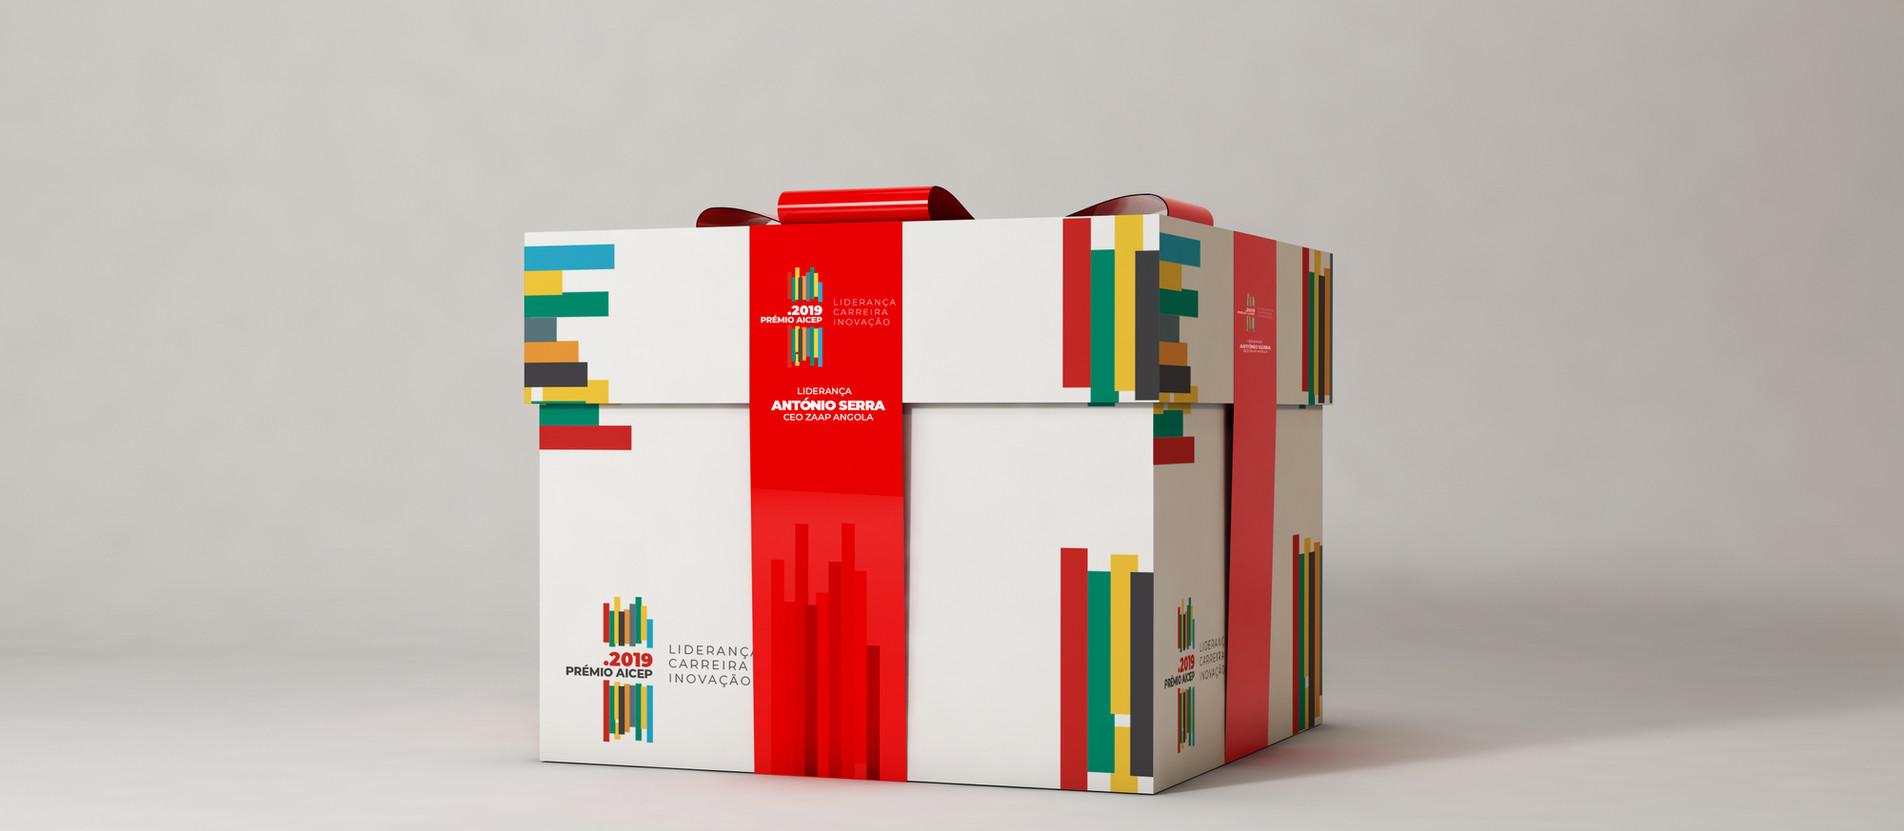 Branding - Prémio AICEP 2019 Gift Box